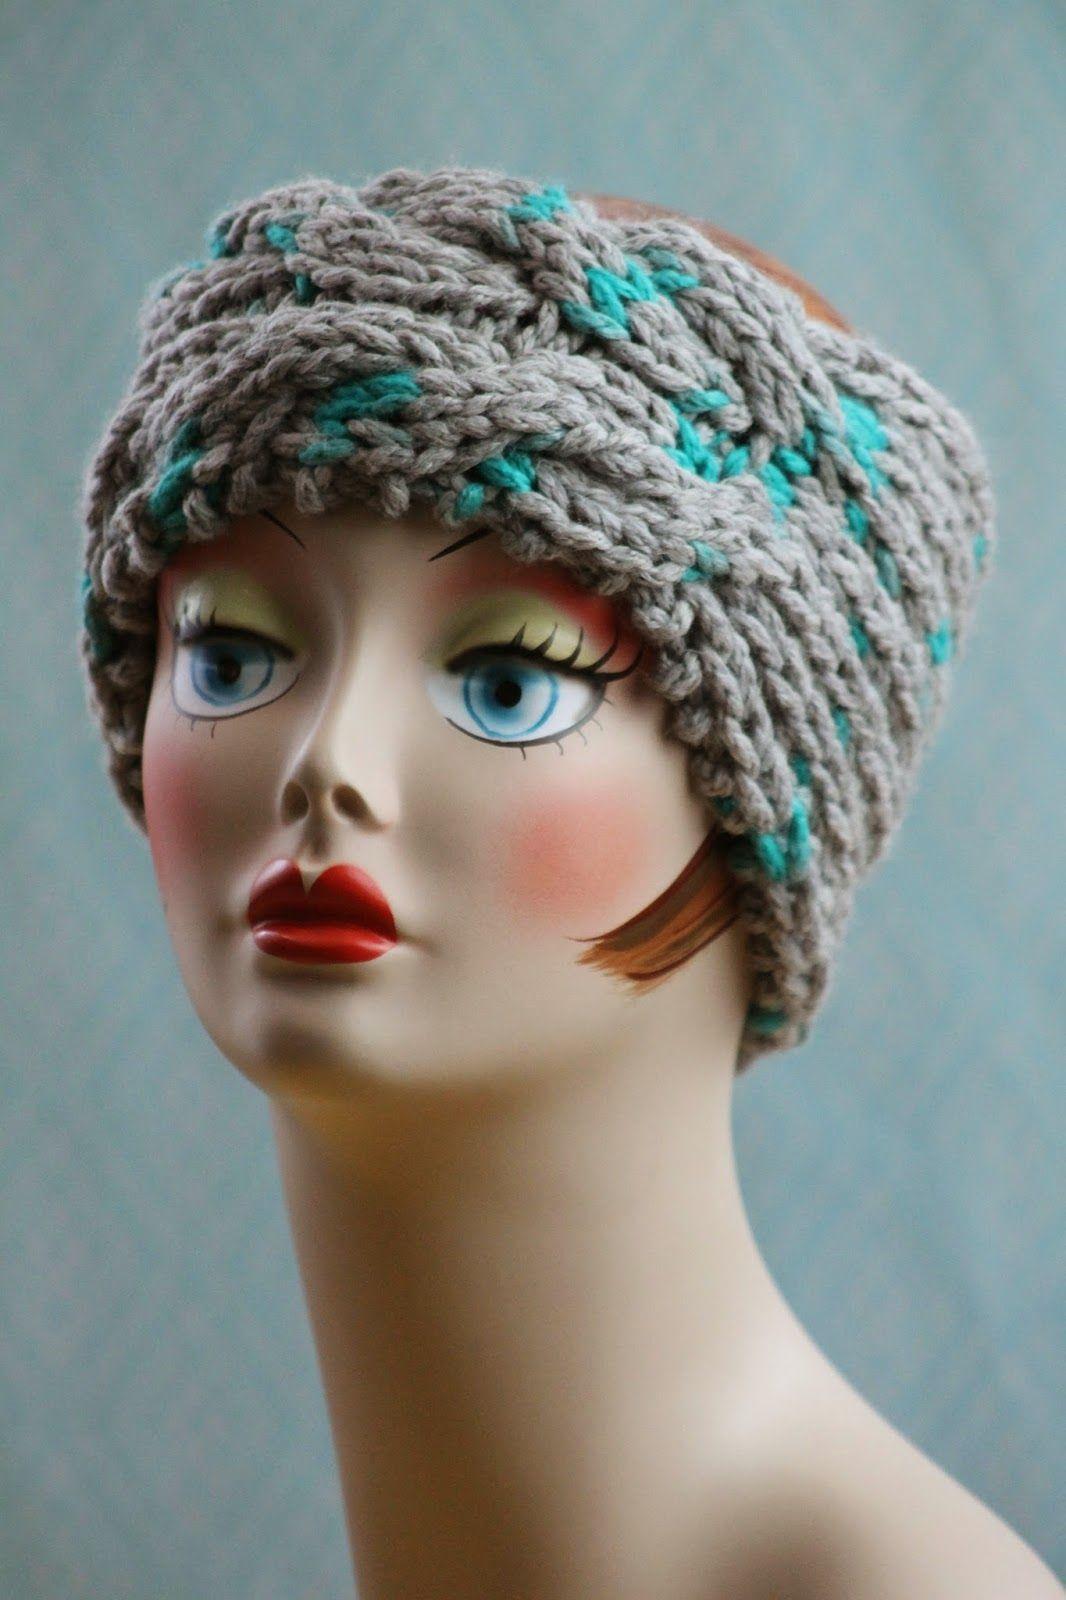 free pattern - Blue Angel Headband Balls to the Walls Knits, A ...